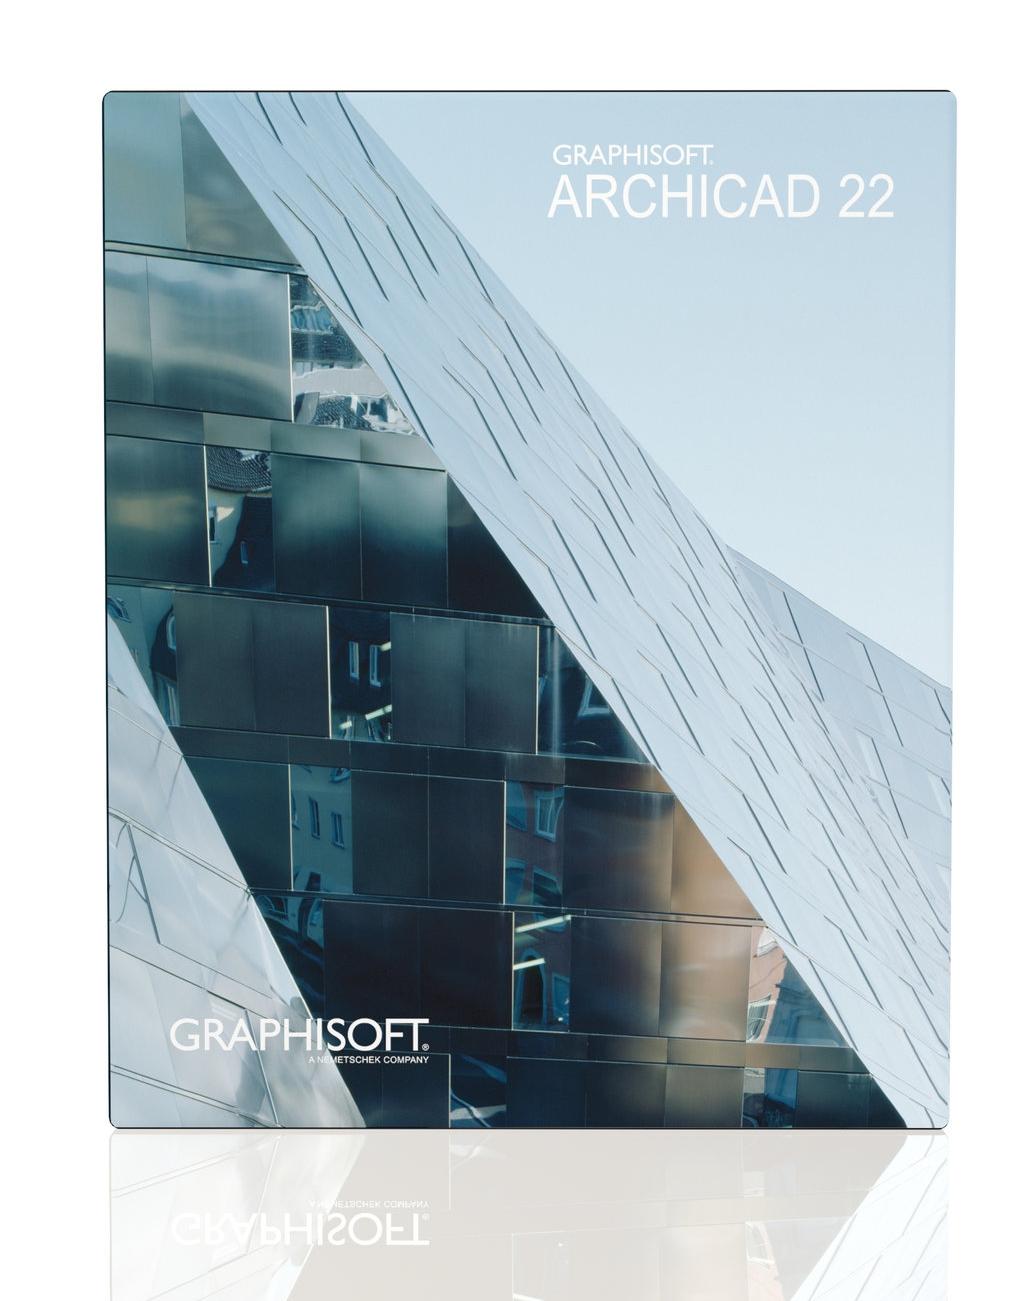 ARCHICAD_22_Box_render_2.jpg